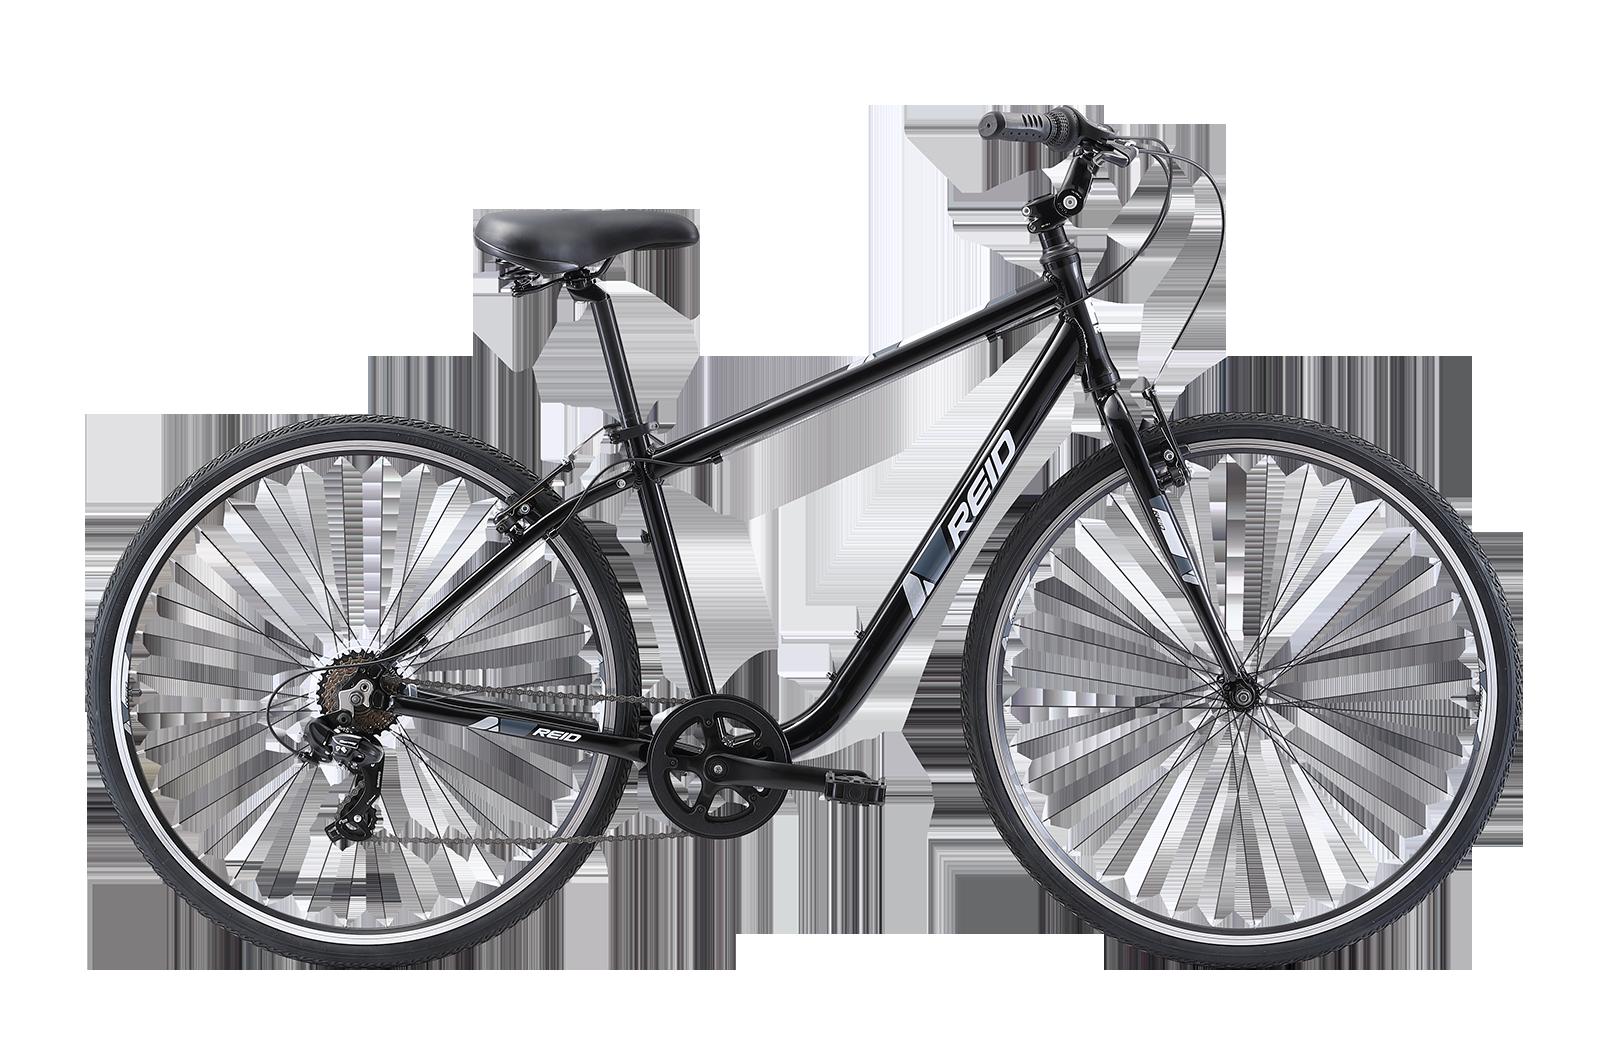 IMG 0027 1 2 - Reid ® - Comfort 1 Bike